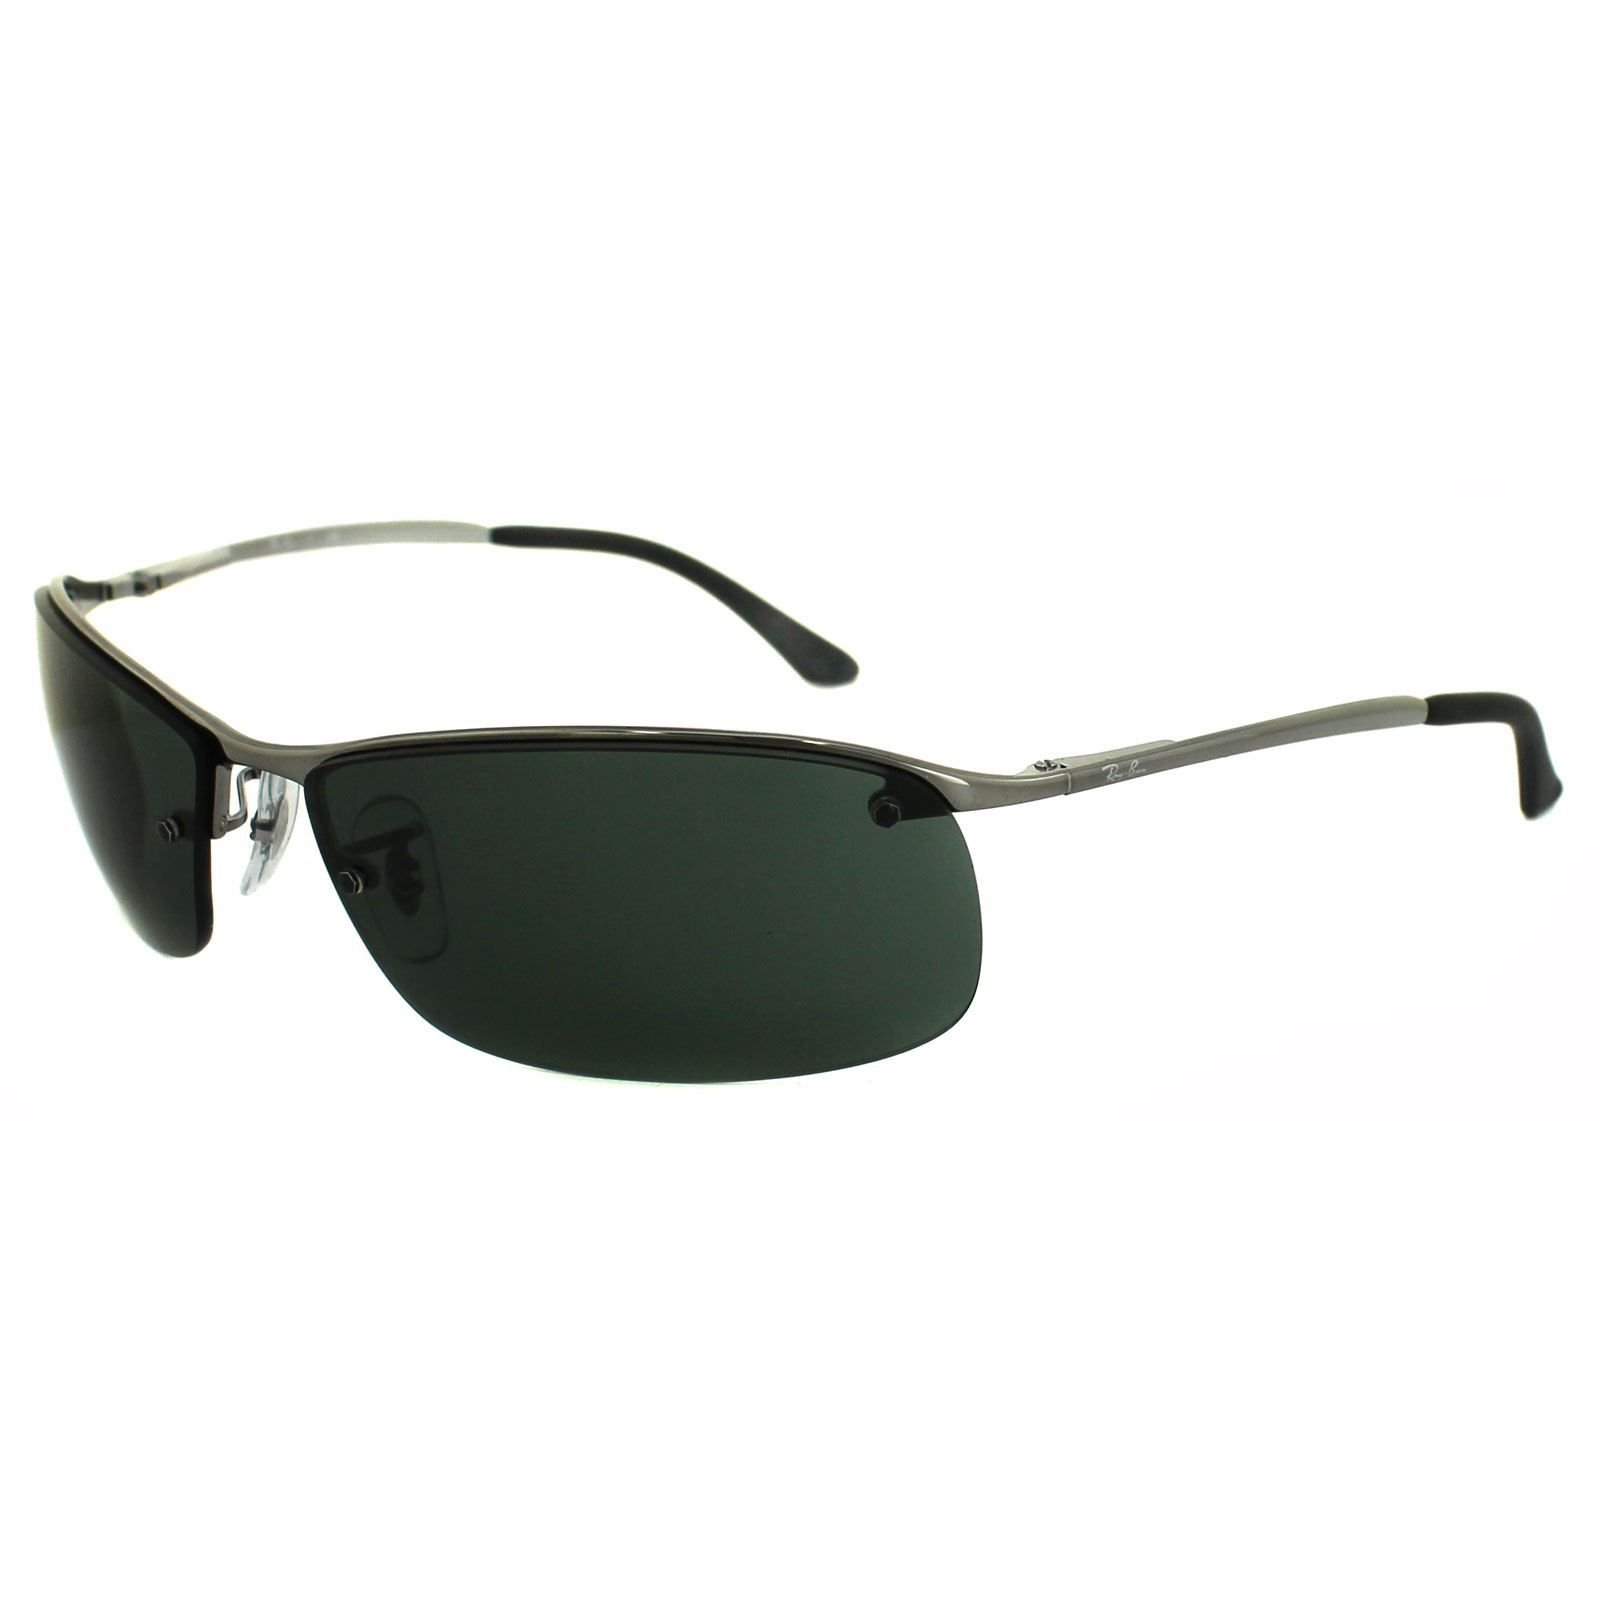 Ray-Ban Sunglasses 3183 004 71 Gunmetal Green